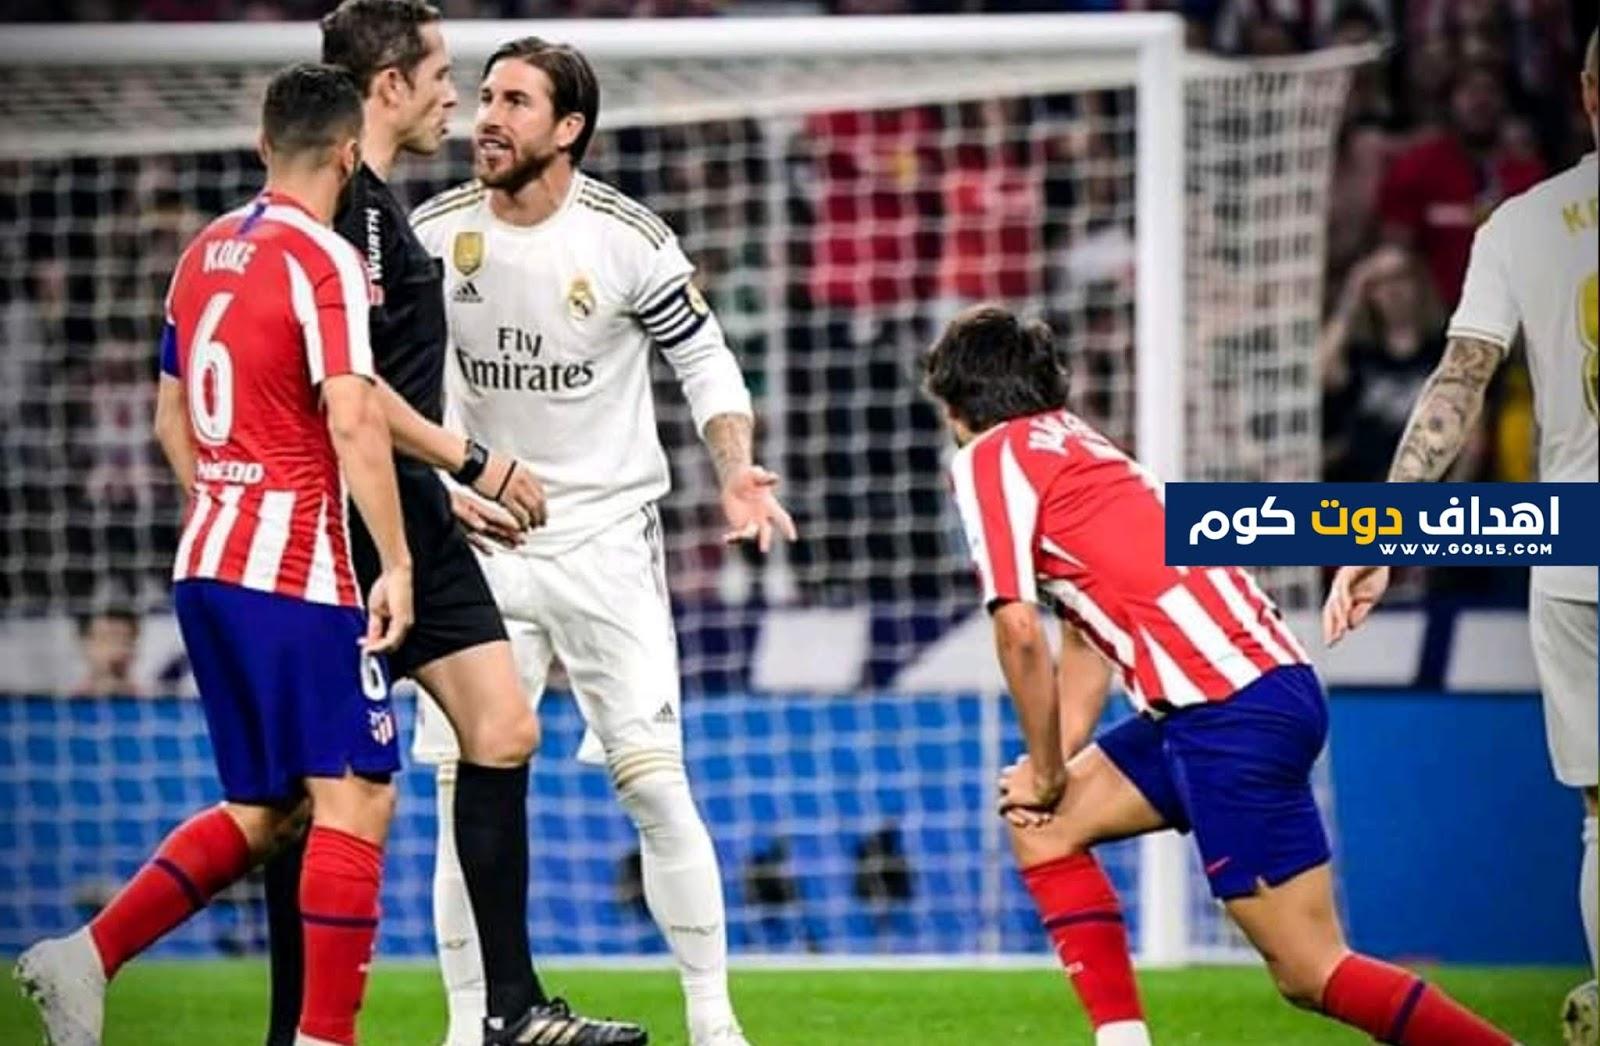 صور ريال مدريد 2019 ، صور ريال مدريد 2020